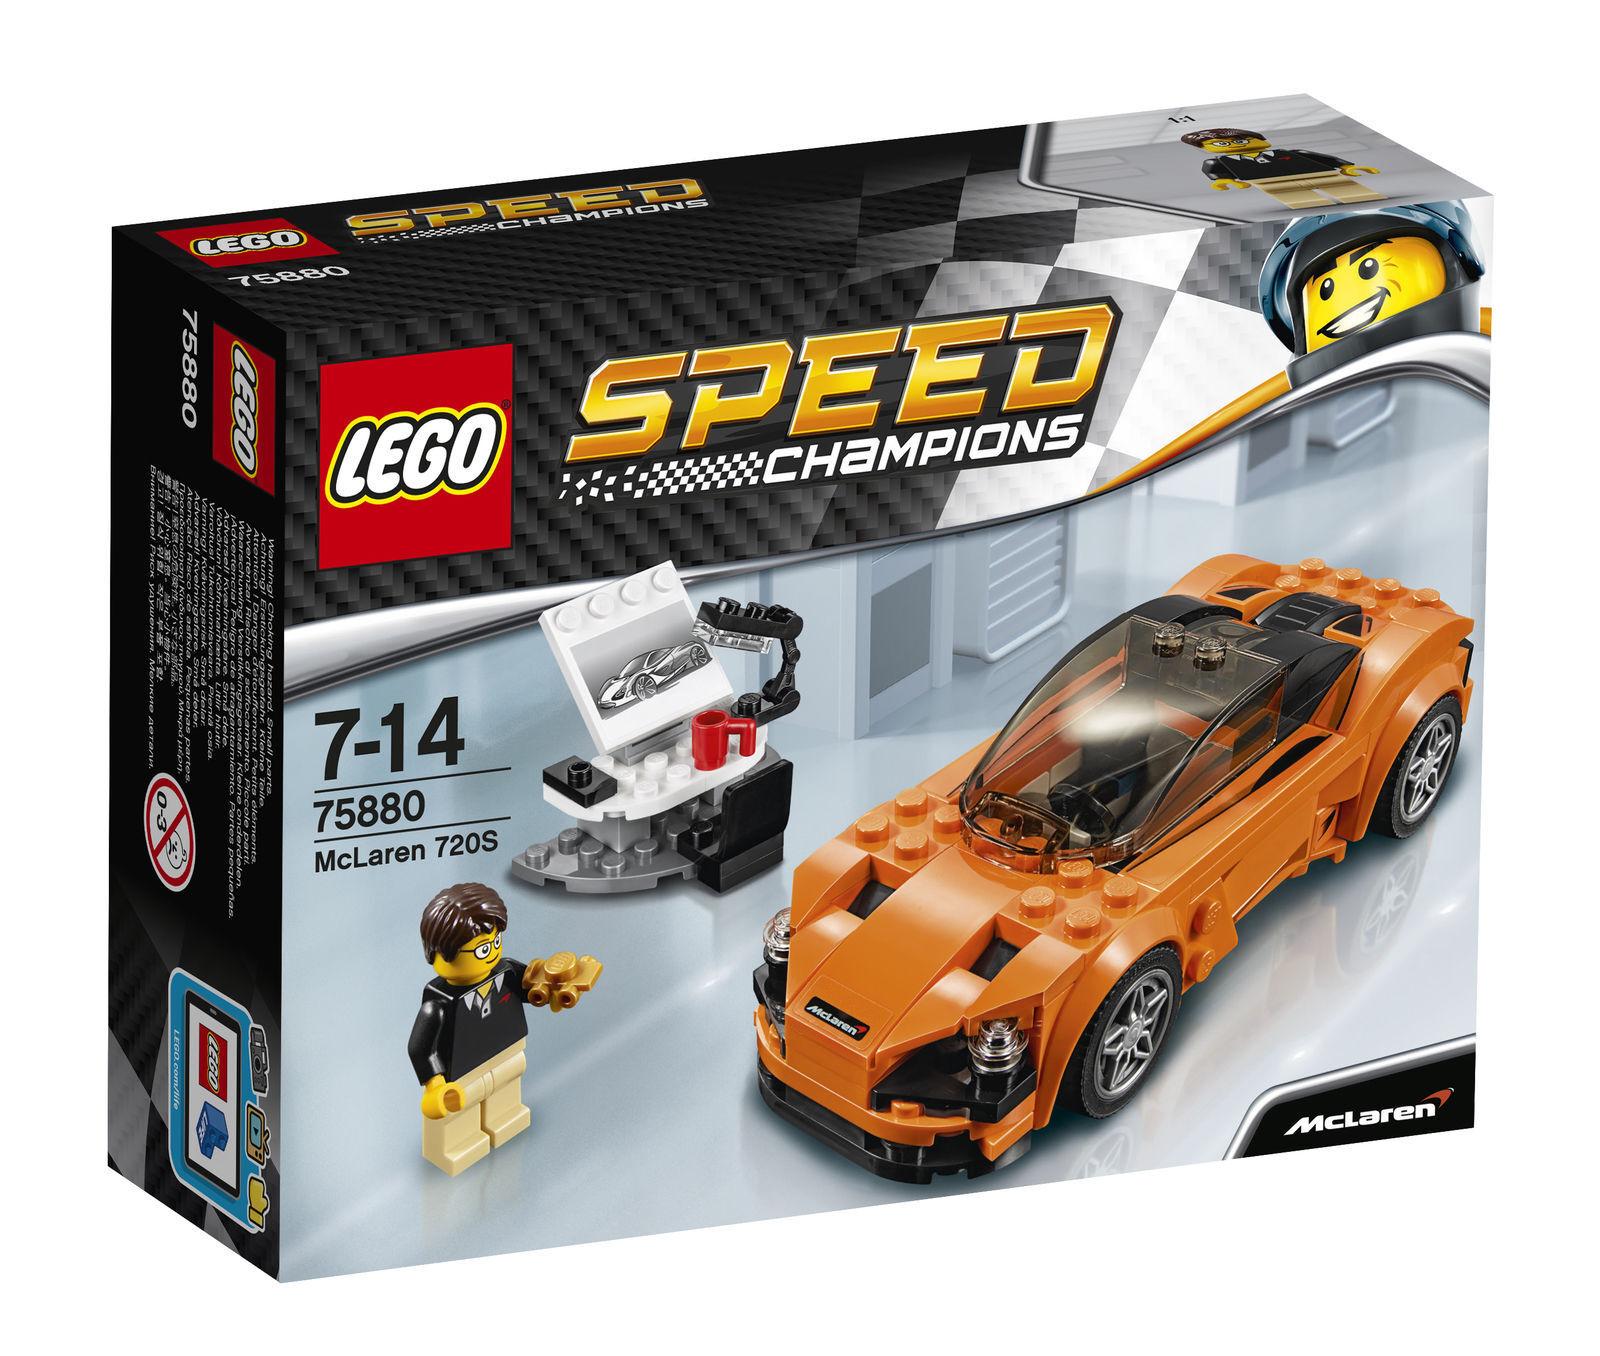 LEGO Speed Champions McLaren 720 S  2017 (75880)  magasiner en ligne aujourd'hui